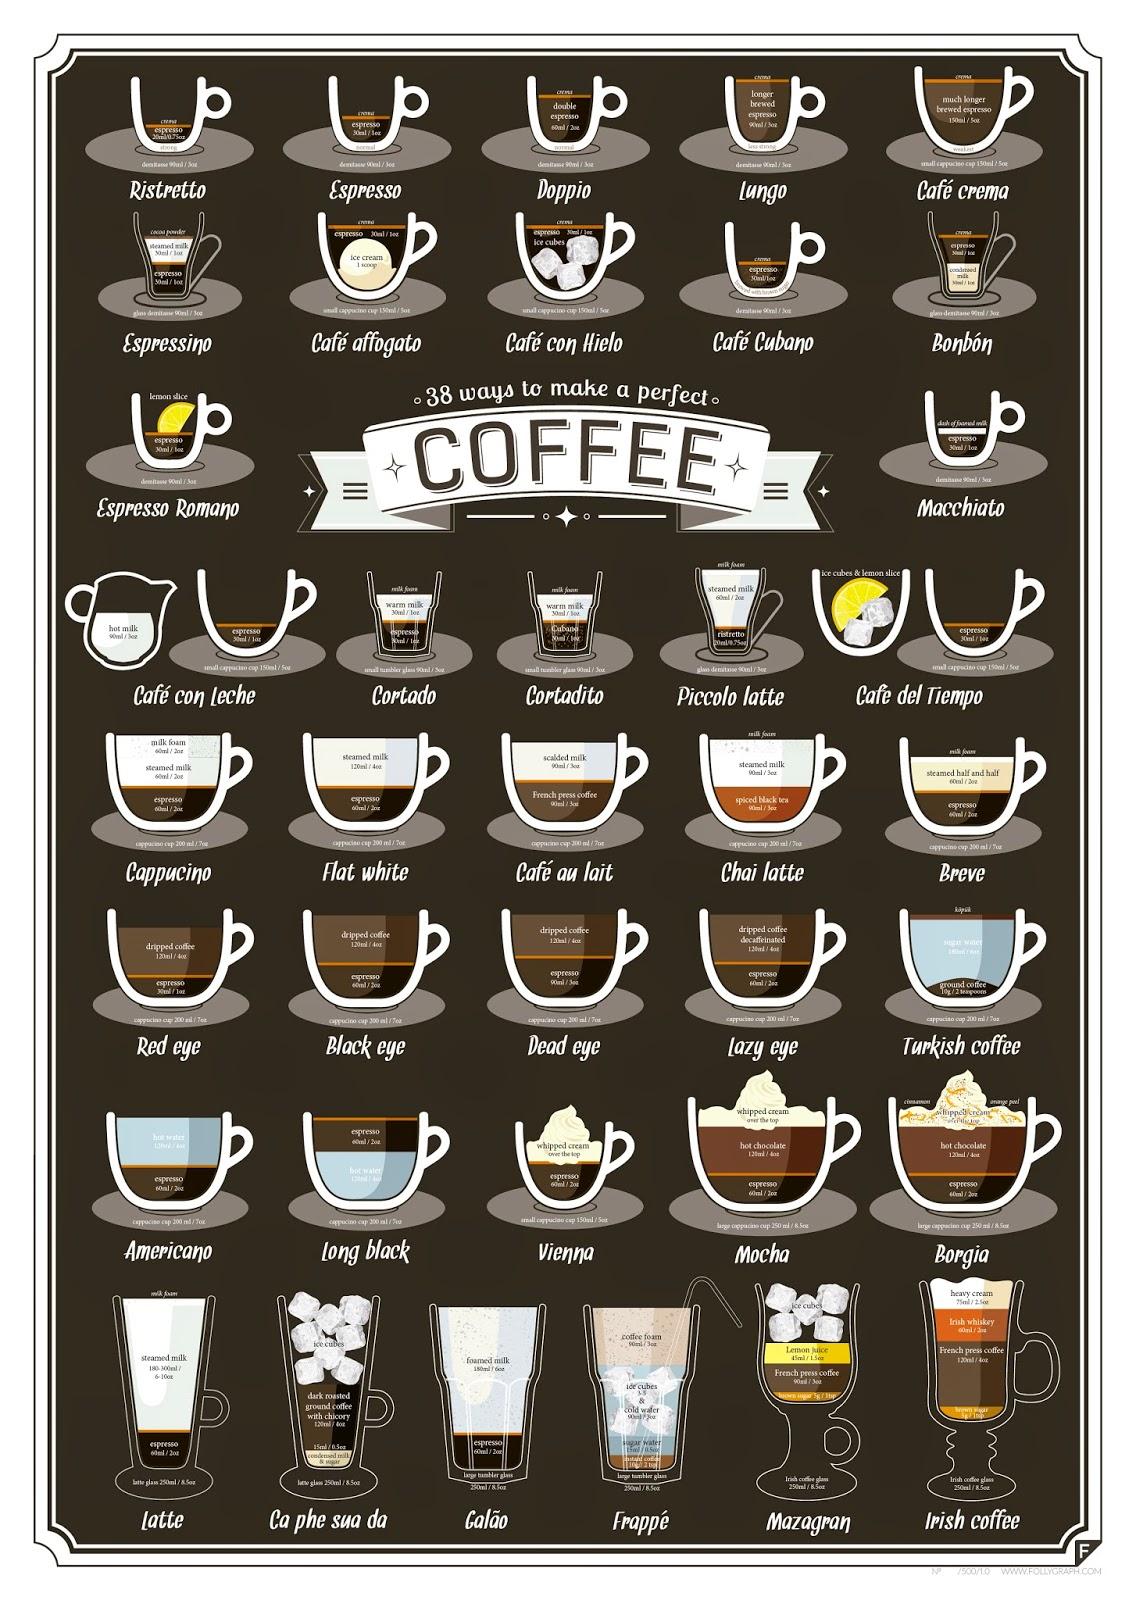 38 Maneras de Hacer Cafe